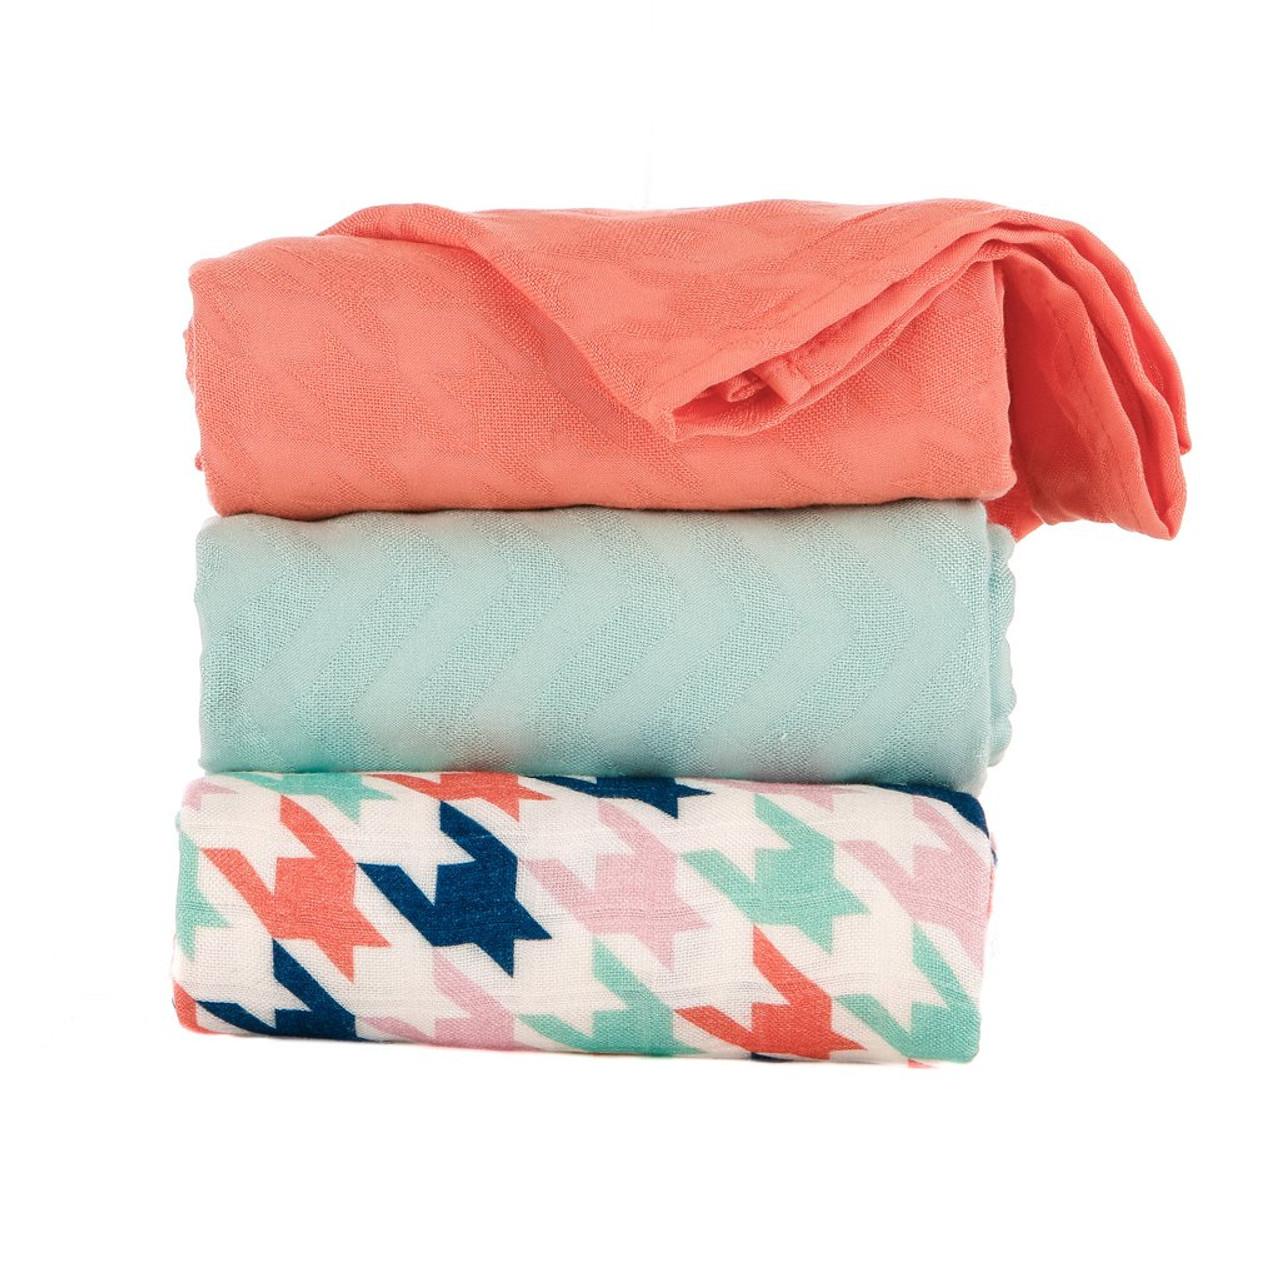 Tula Blanket Sets